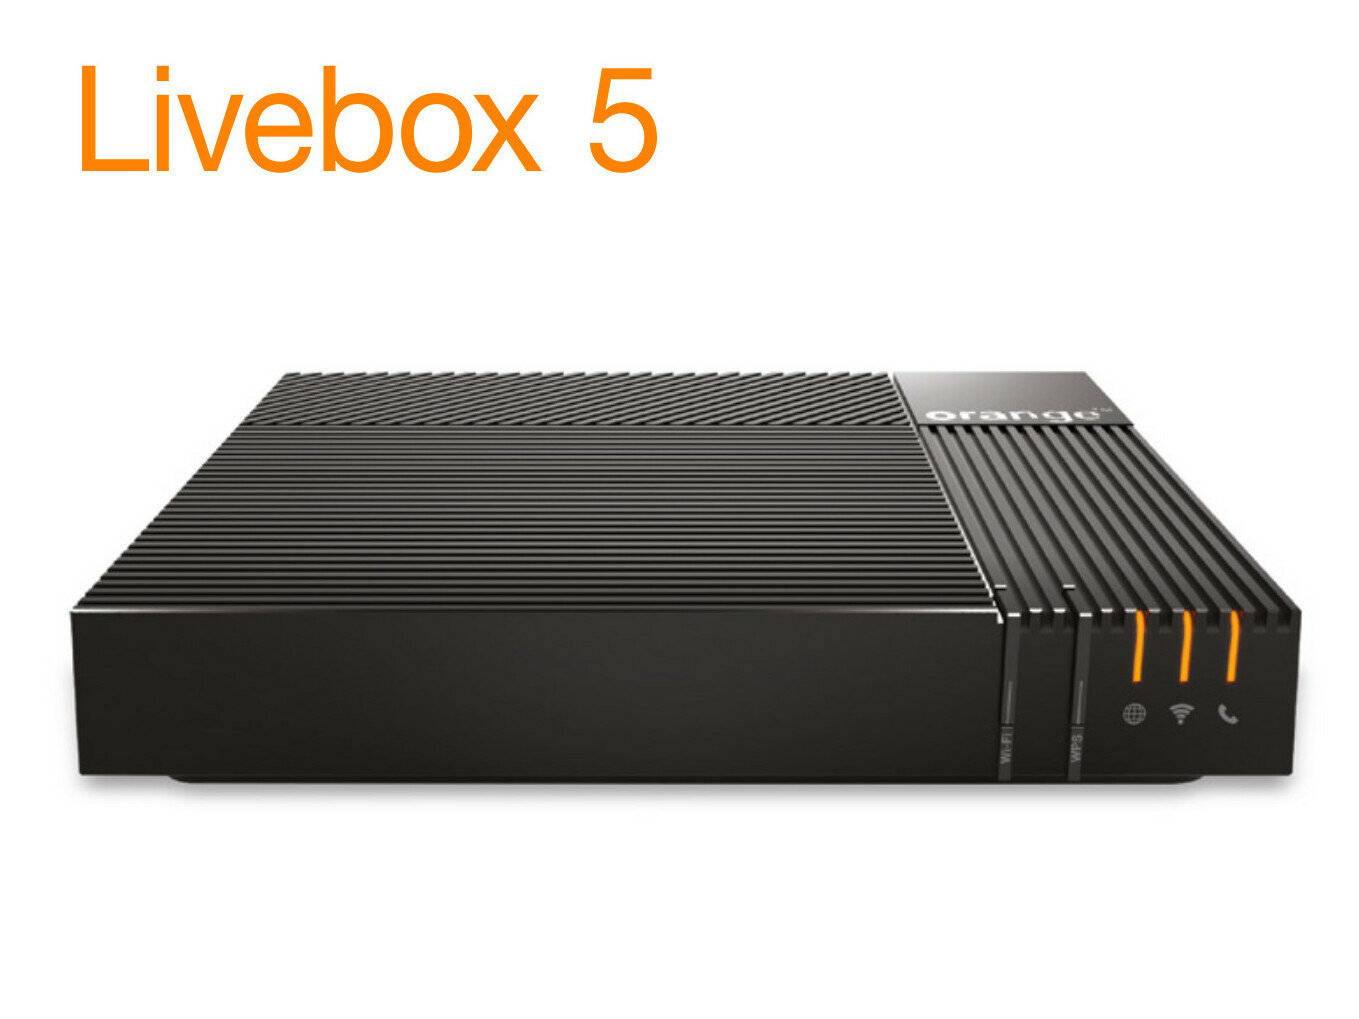 Livebox et domotique : Orange et Somfy s'associent